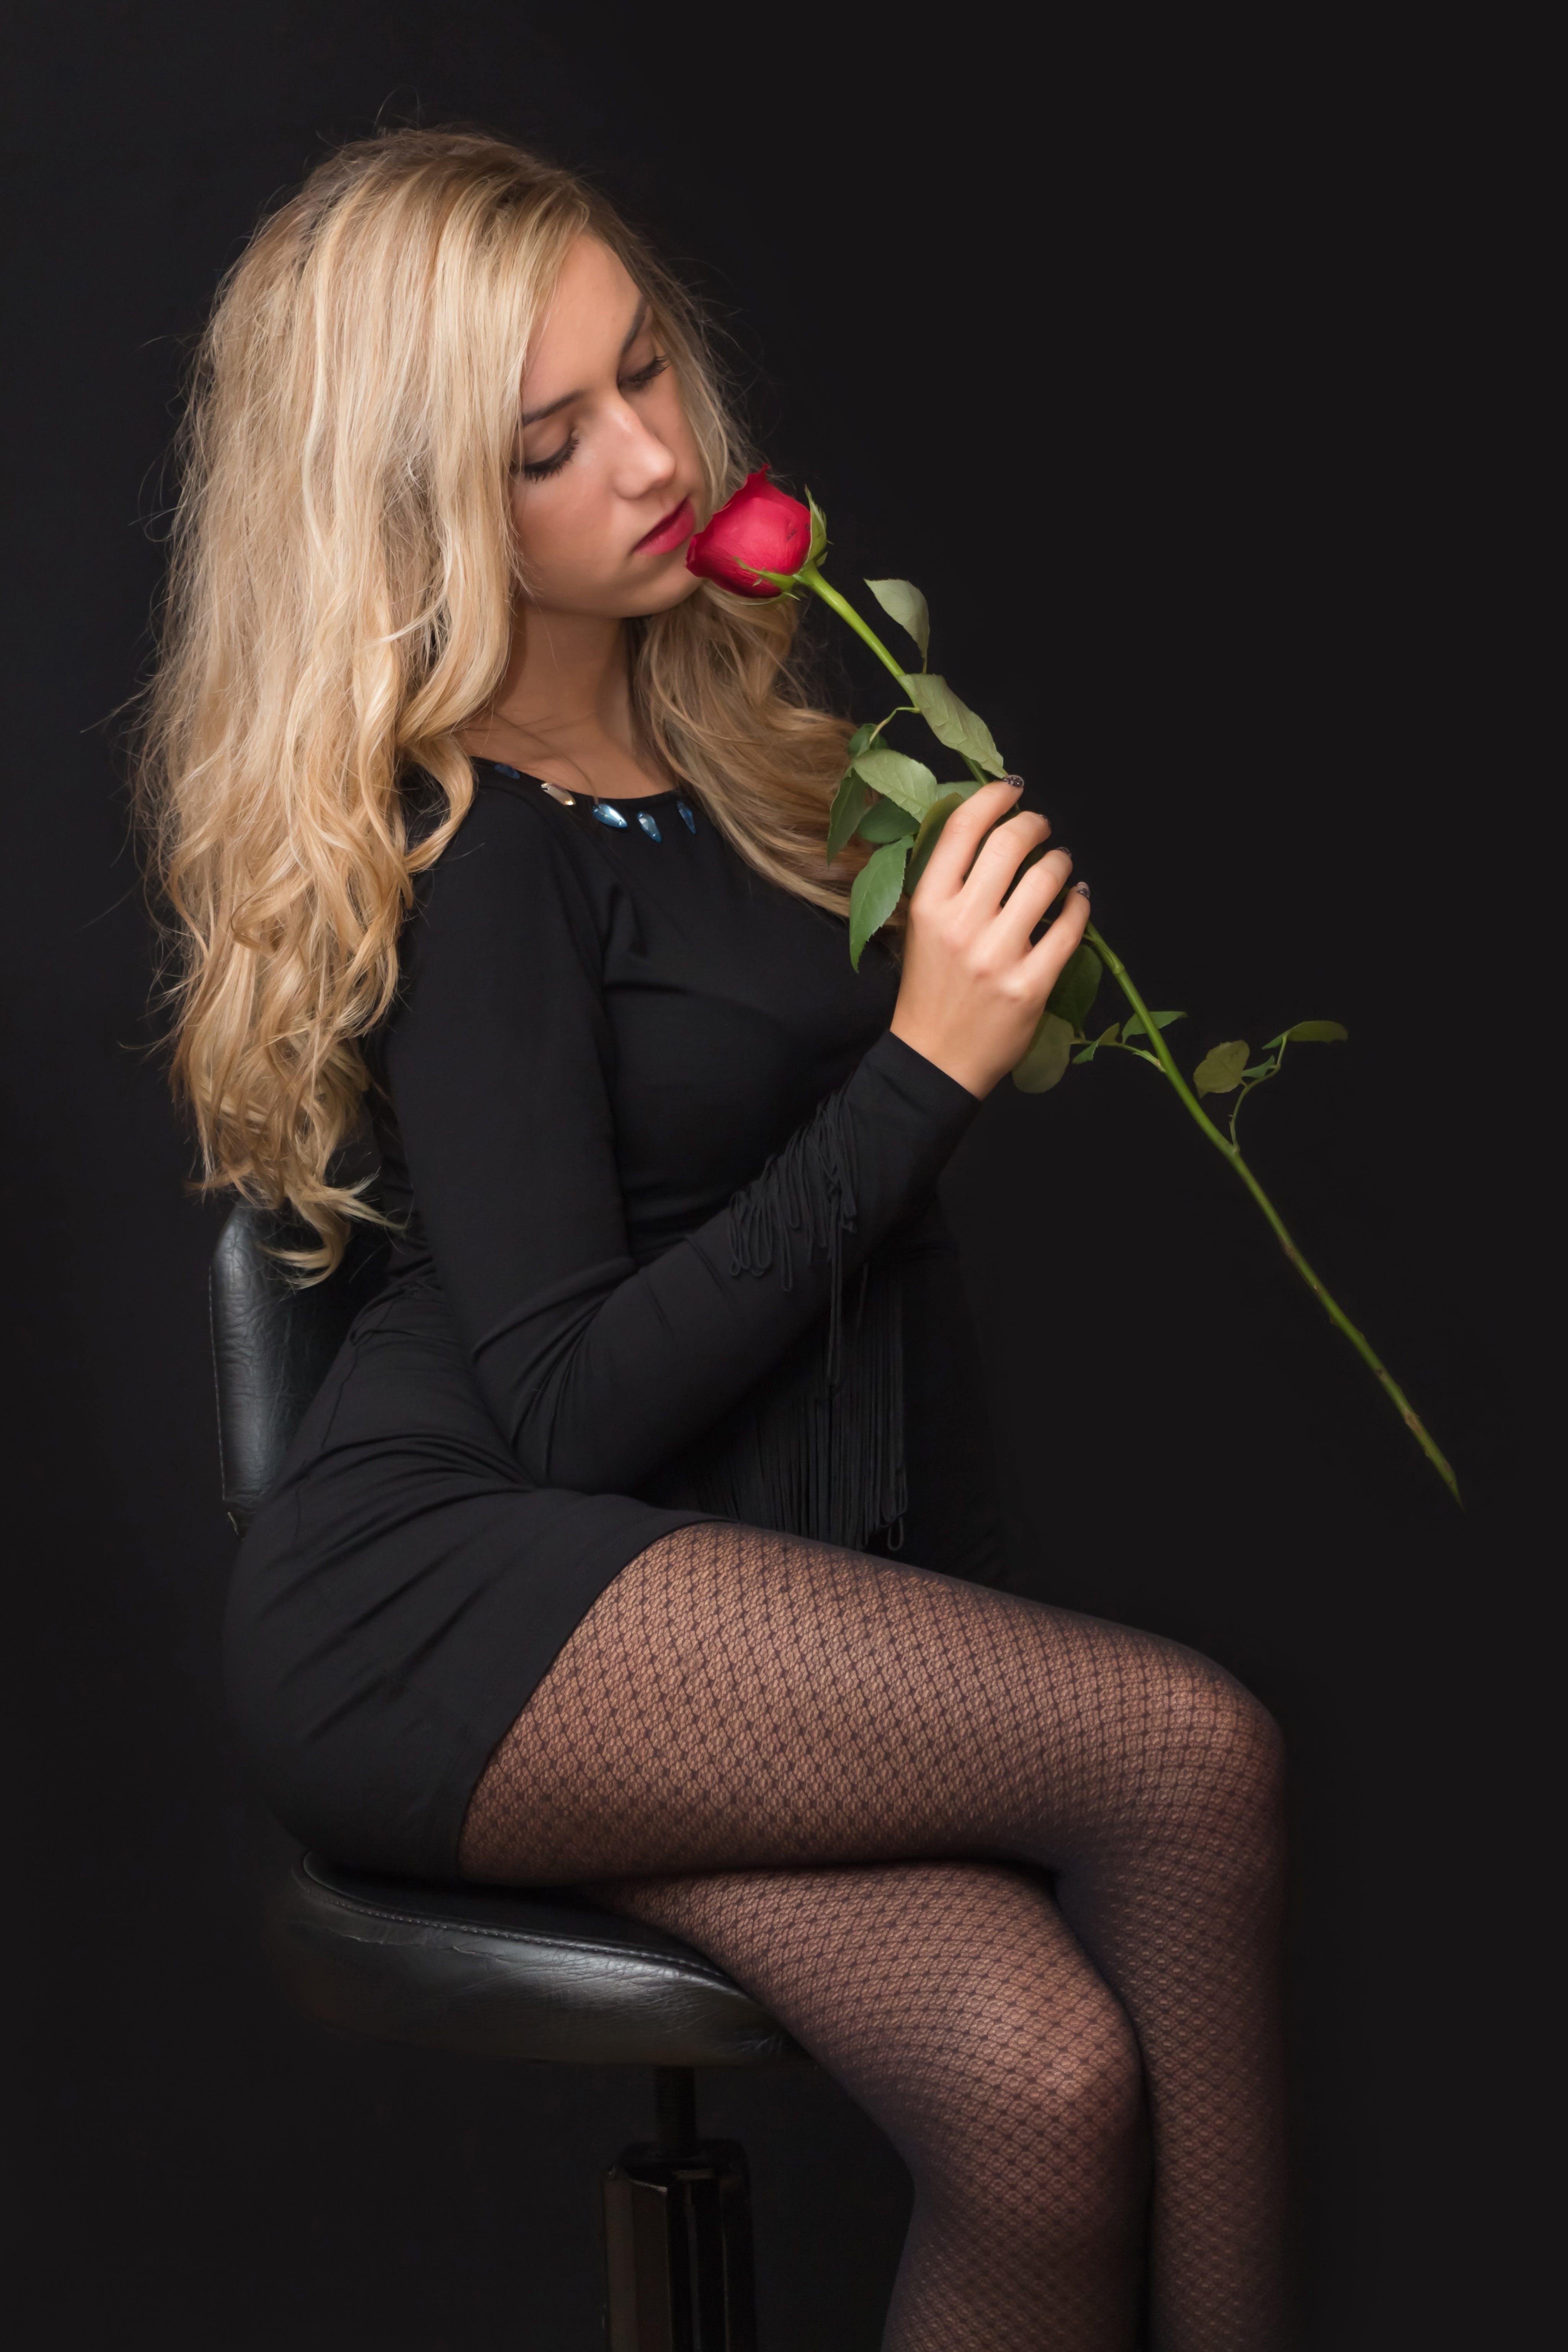 Kostenloses Stock Foto zu blond, blume, dame, frau